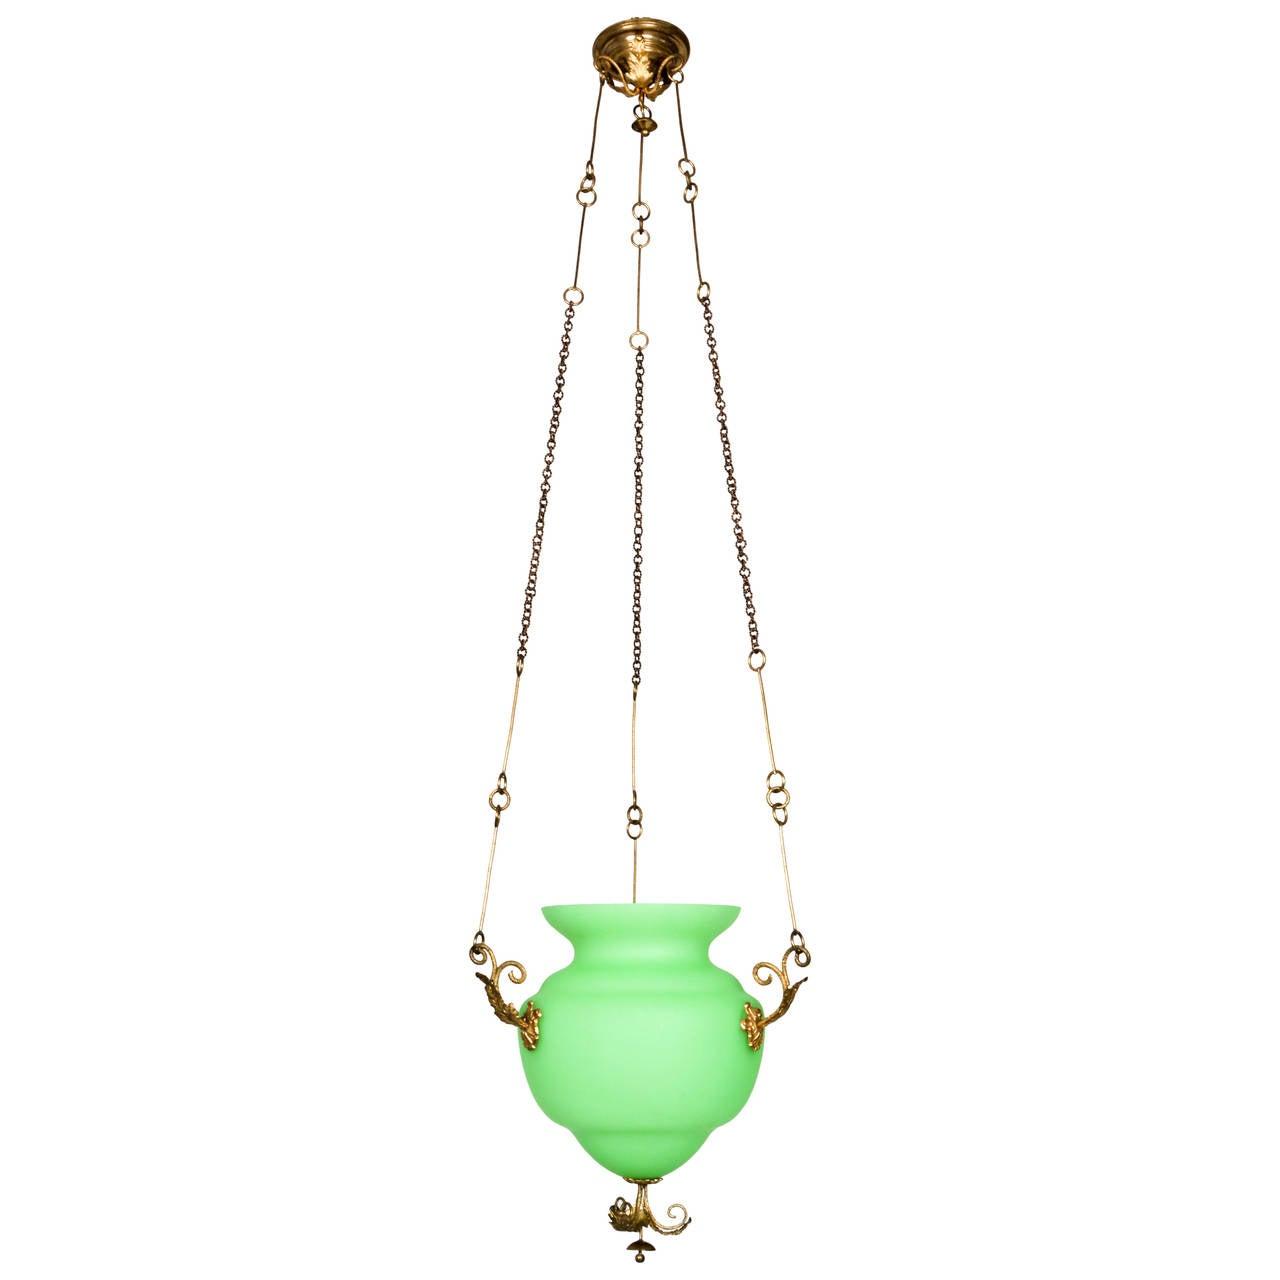 Mid 19th Century Green Opaque Glass Biedermeier Pendant